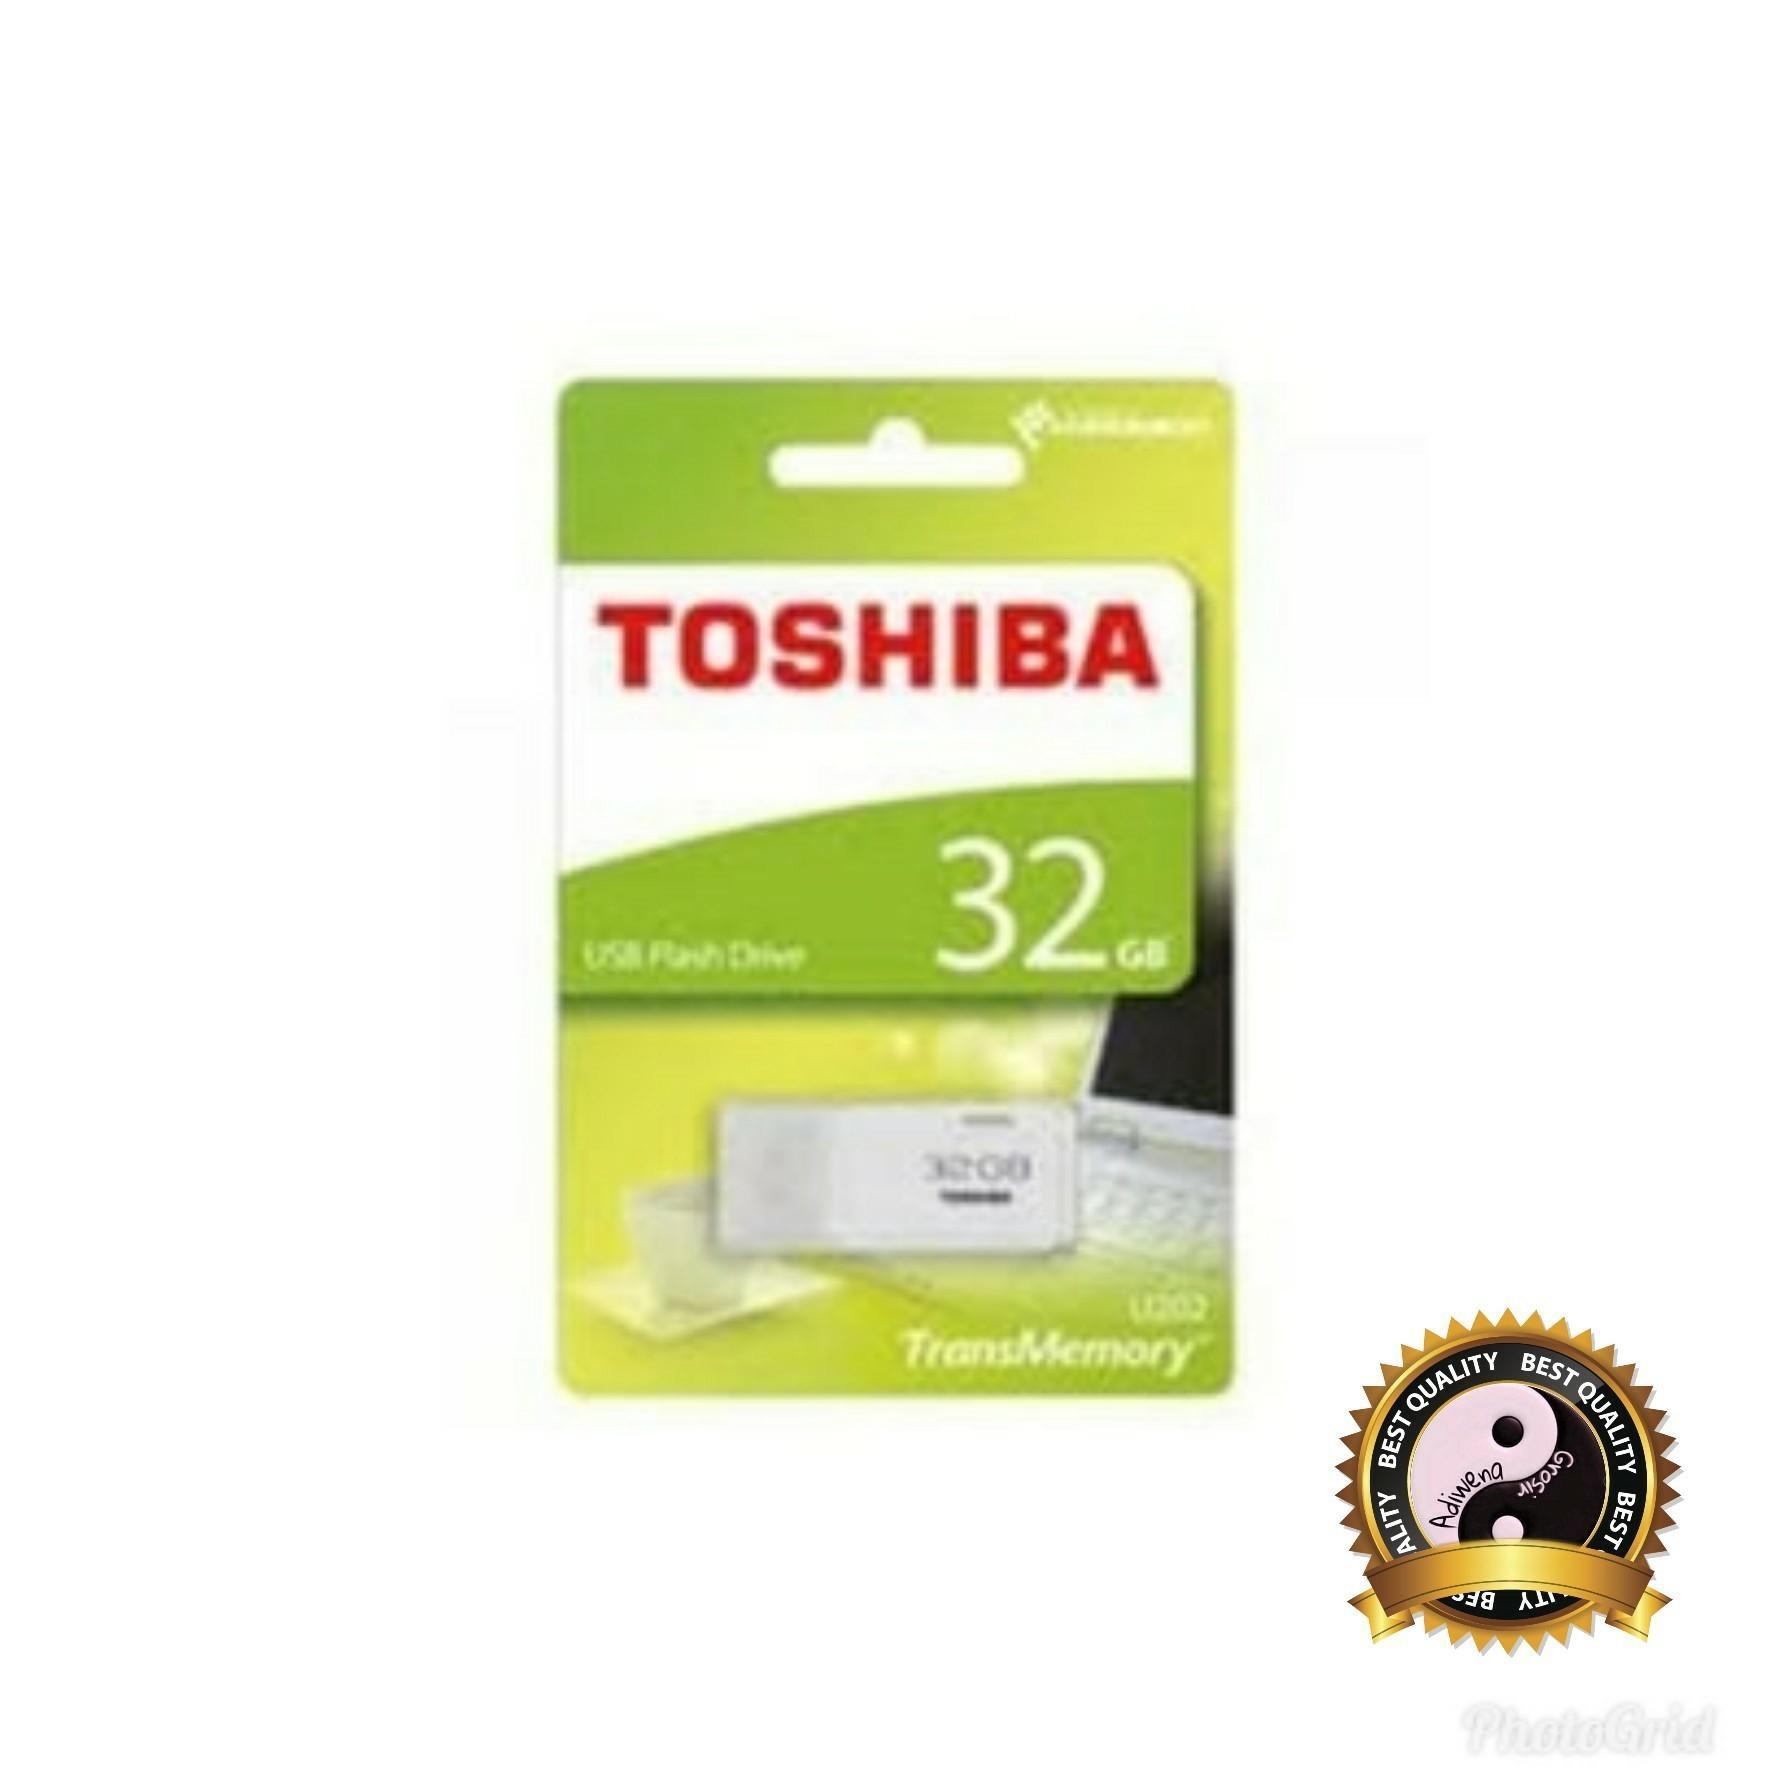 Flash Disk Original / Flashdisk USB Flash Memory Toshiba 64 GB Transmemory 64gb Hitam